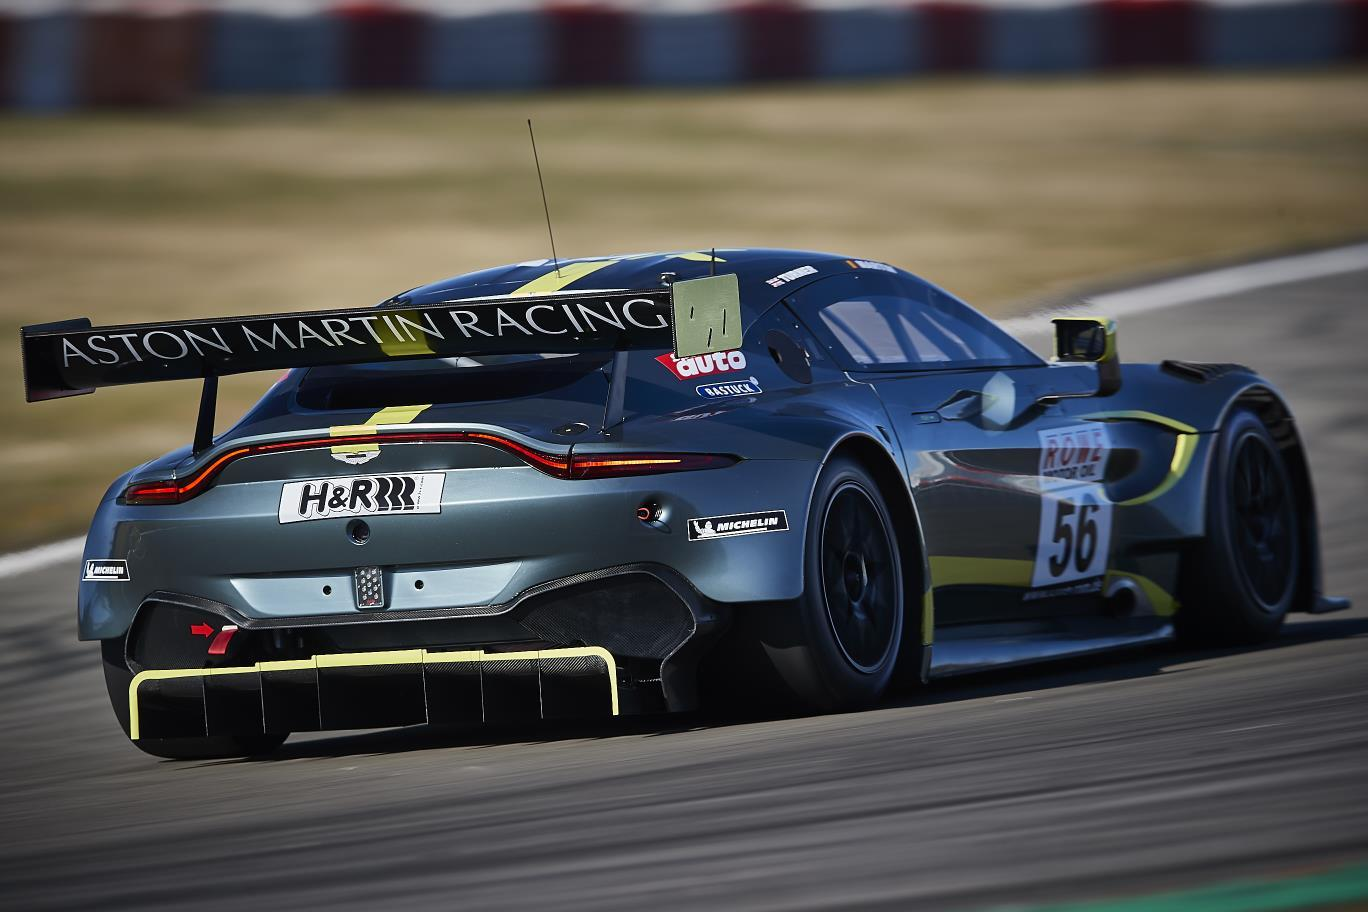 Aston Martin Vantage Gt3 To Take On Abu Dhabi